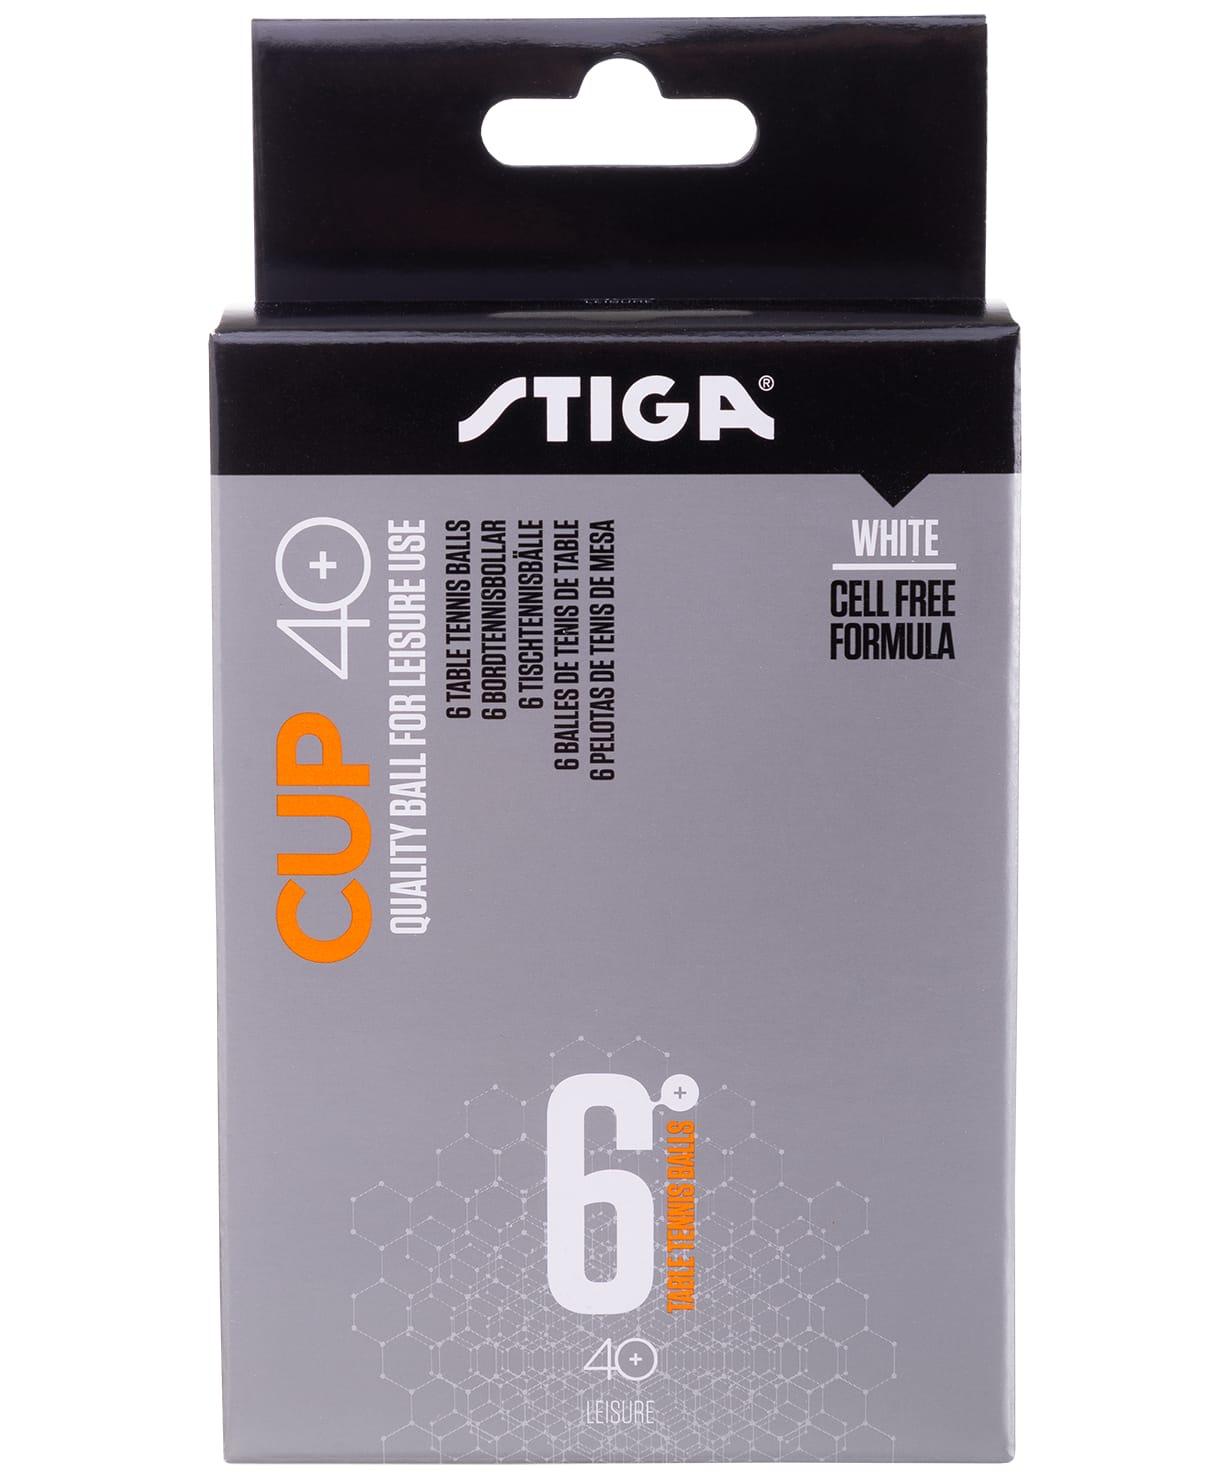 Мяч для настольного тенниса Stiga Cup ABS белый (6 шт.) цена